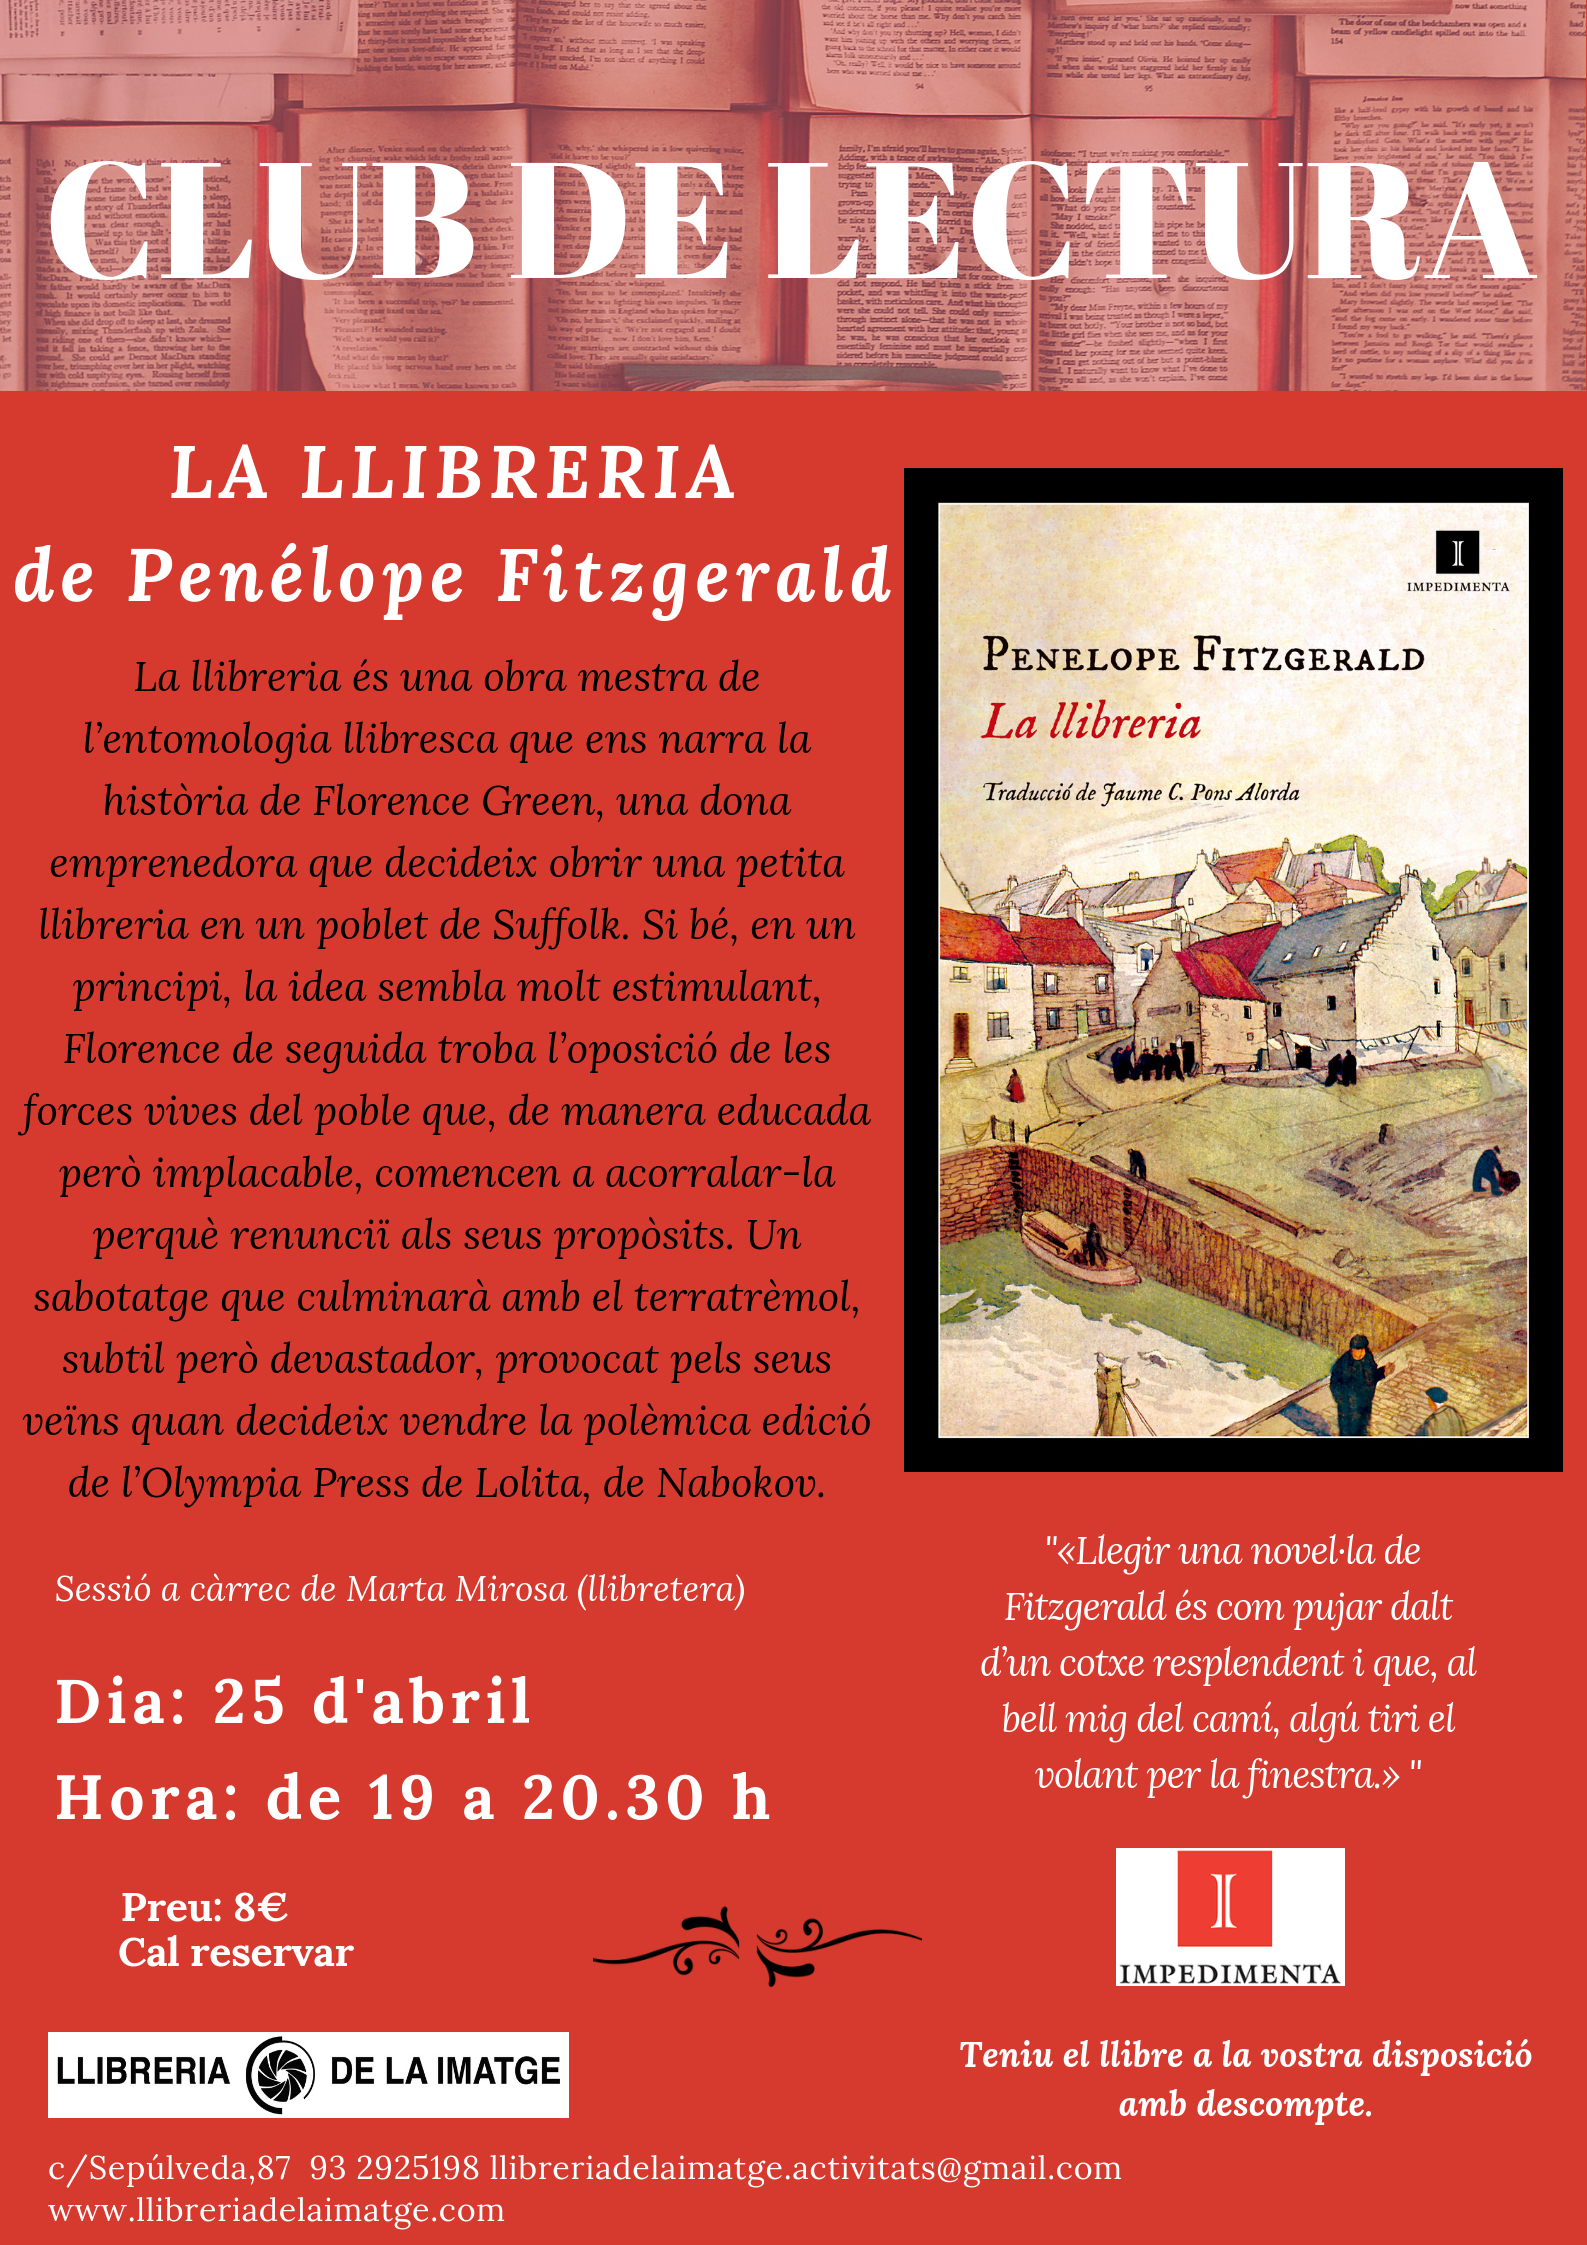 CLUB DE LECTURA LA LLIBRERIA